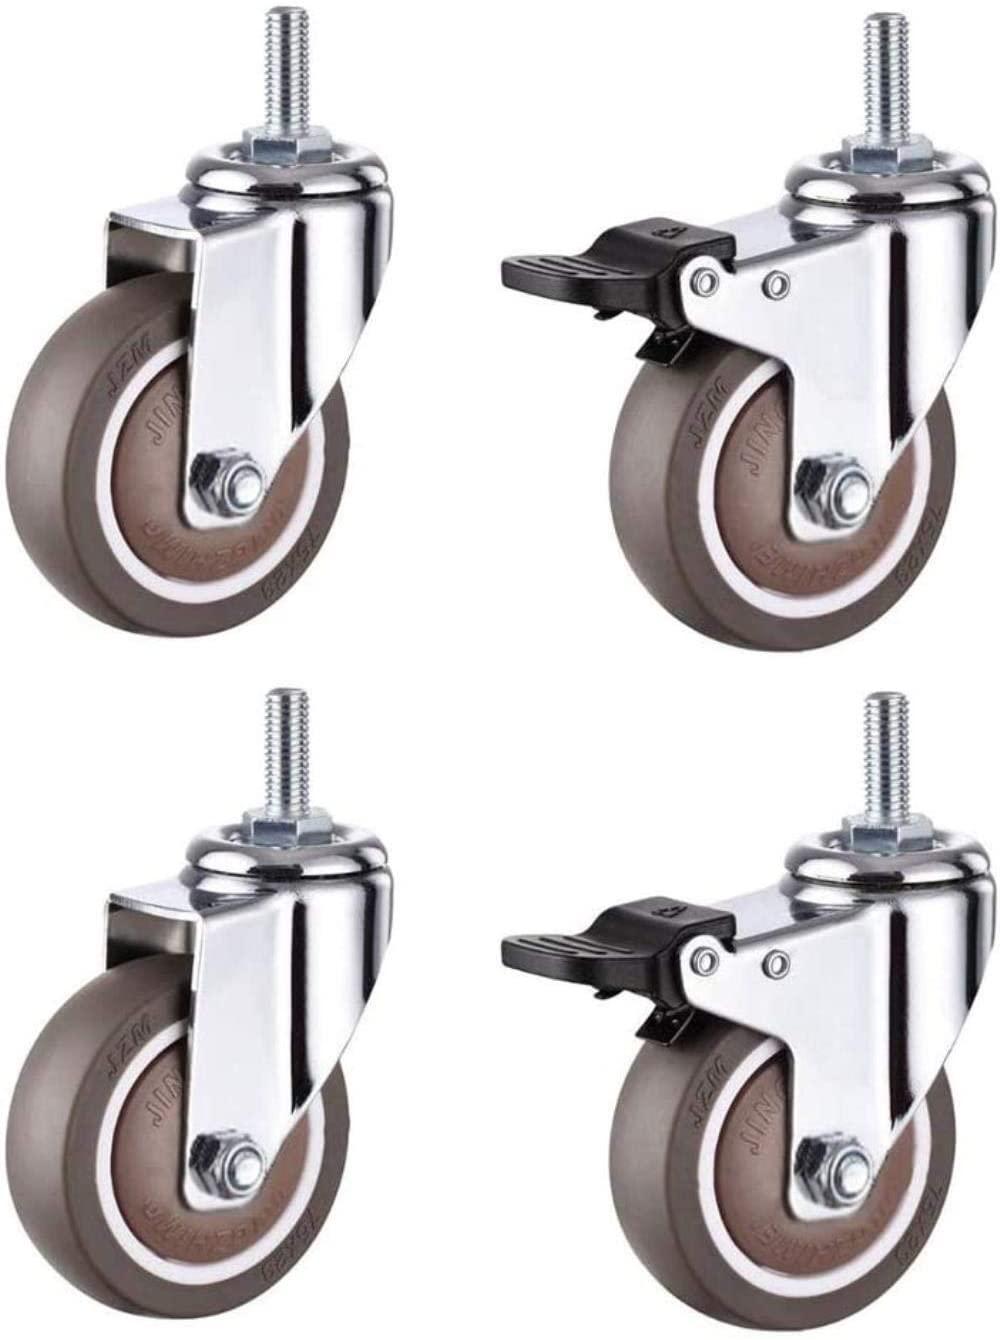 Office Chair Caster Wheels FANYF X4 Castor Wheel, Furniture Casters, Rubber Caster, Swivel Caster-with Brake, Φ2 / 2.5 / 3in, Load 180kg,2 No Brake+2 Brake,2.5in(63mm)